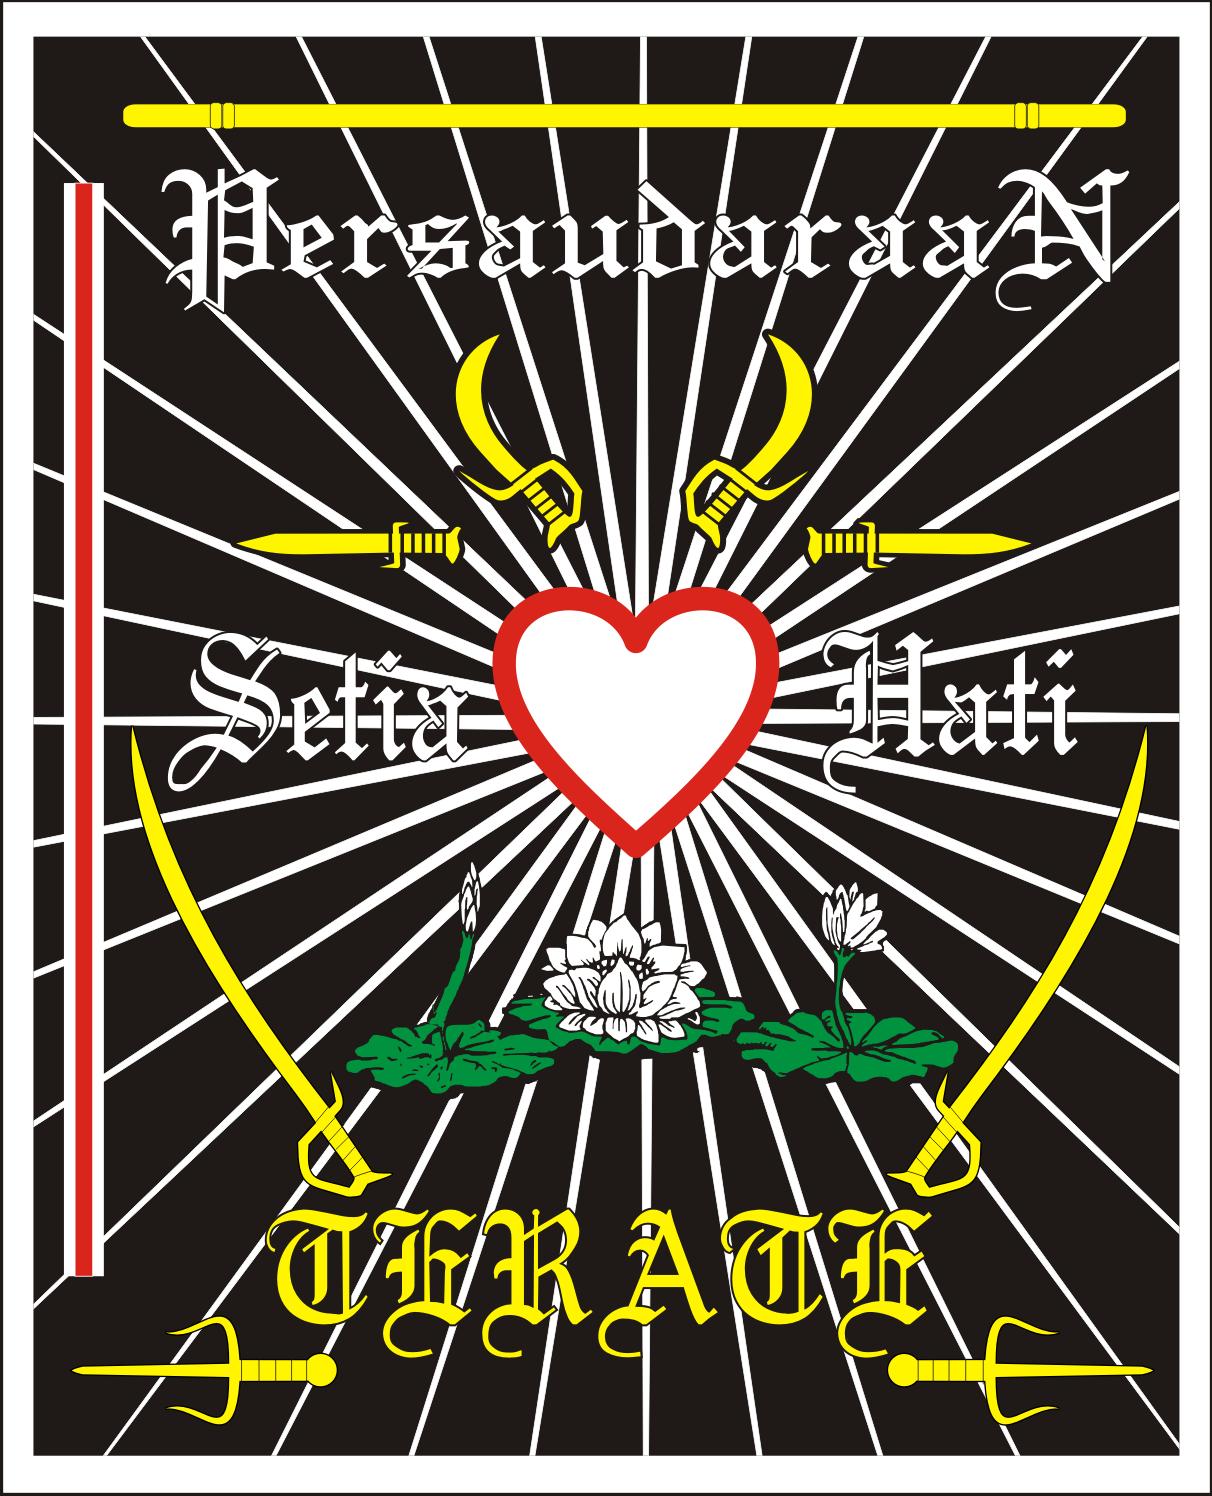 Persaudaraan Setia Hati Terate Logo